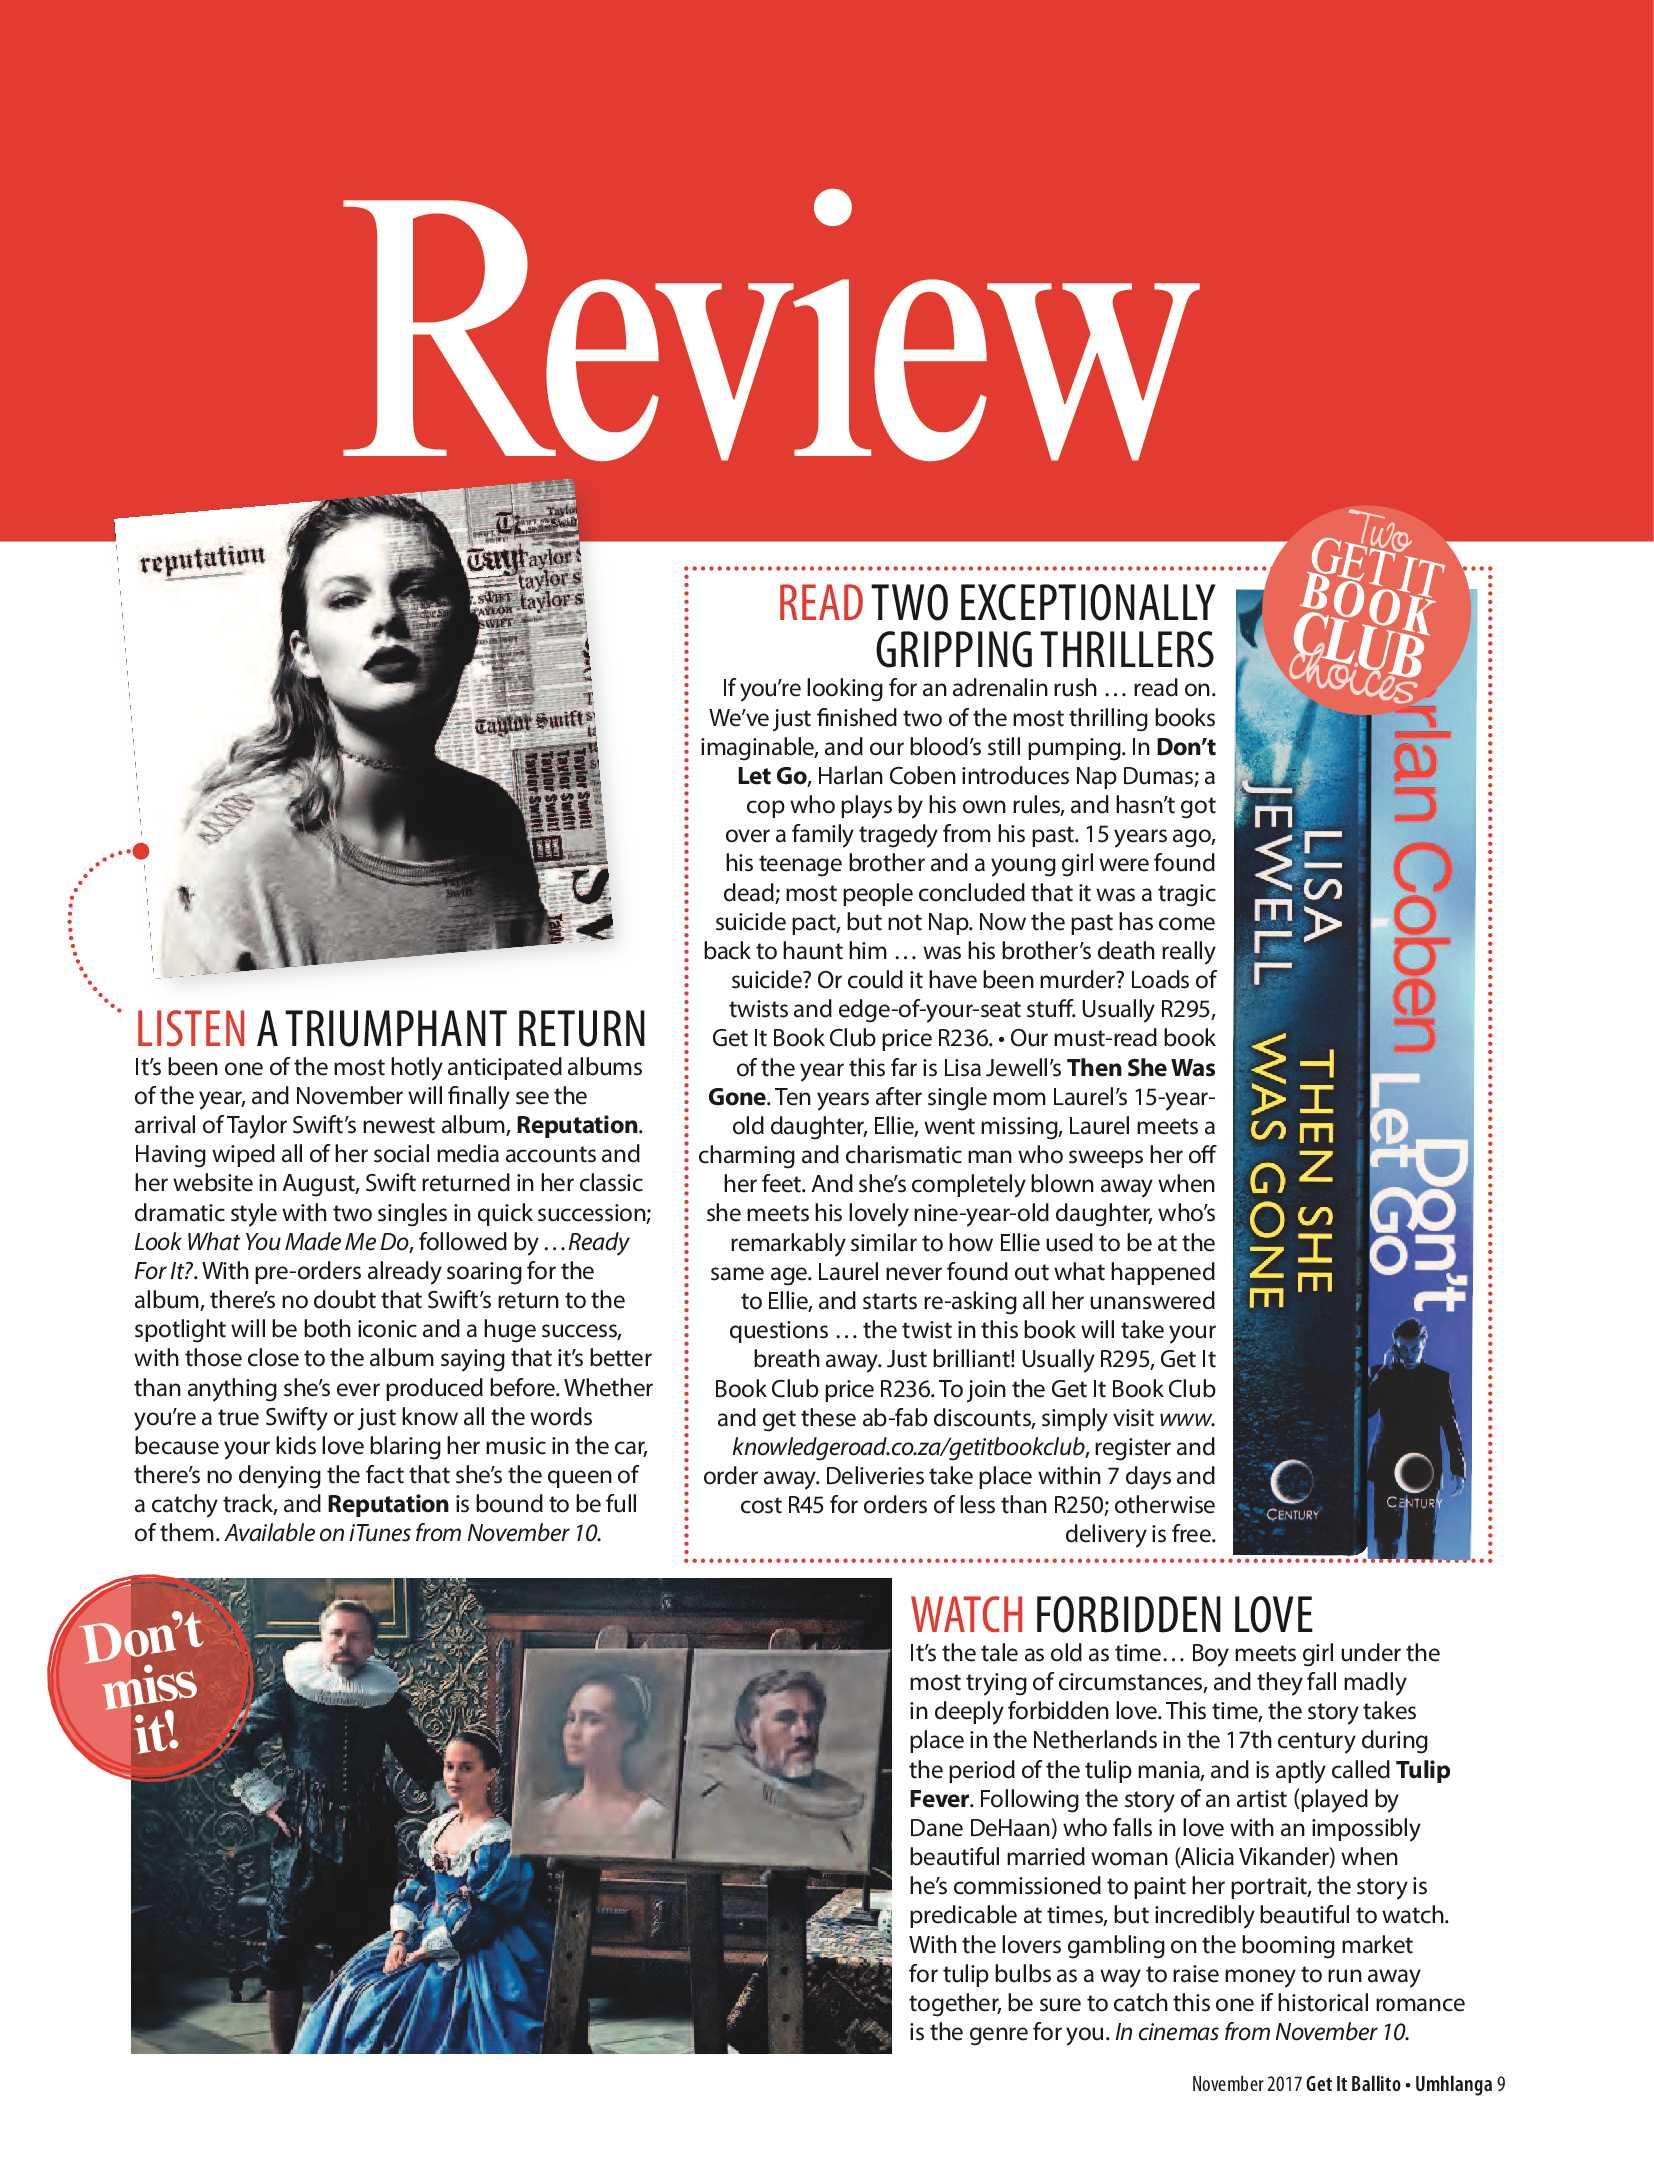 get-magazine-ballitoumhlanga-november-2017-2-epapers-page-11